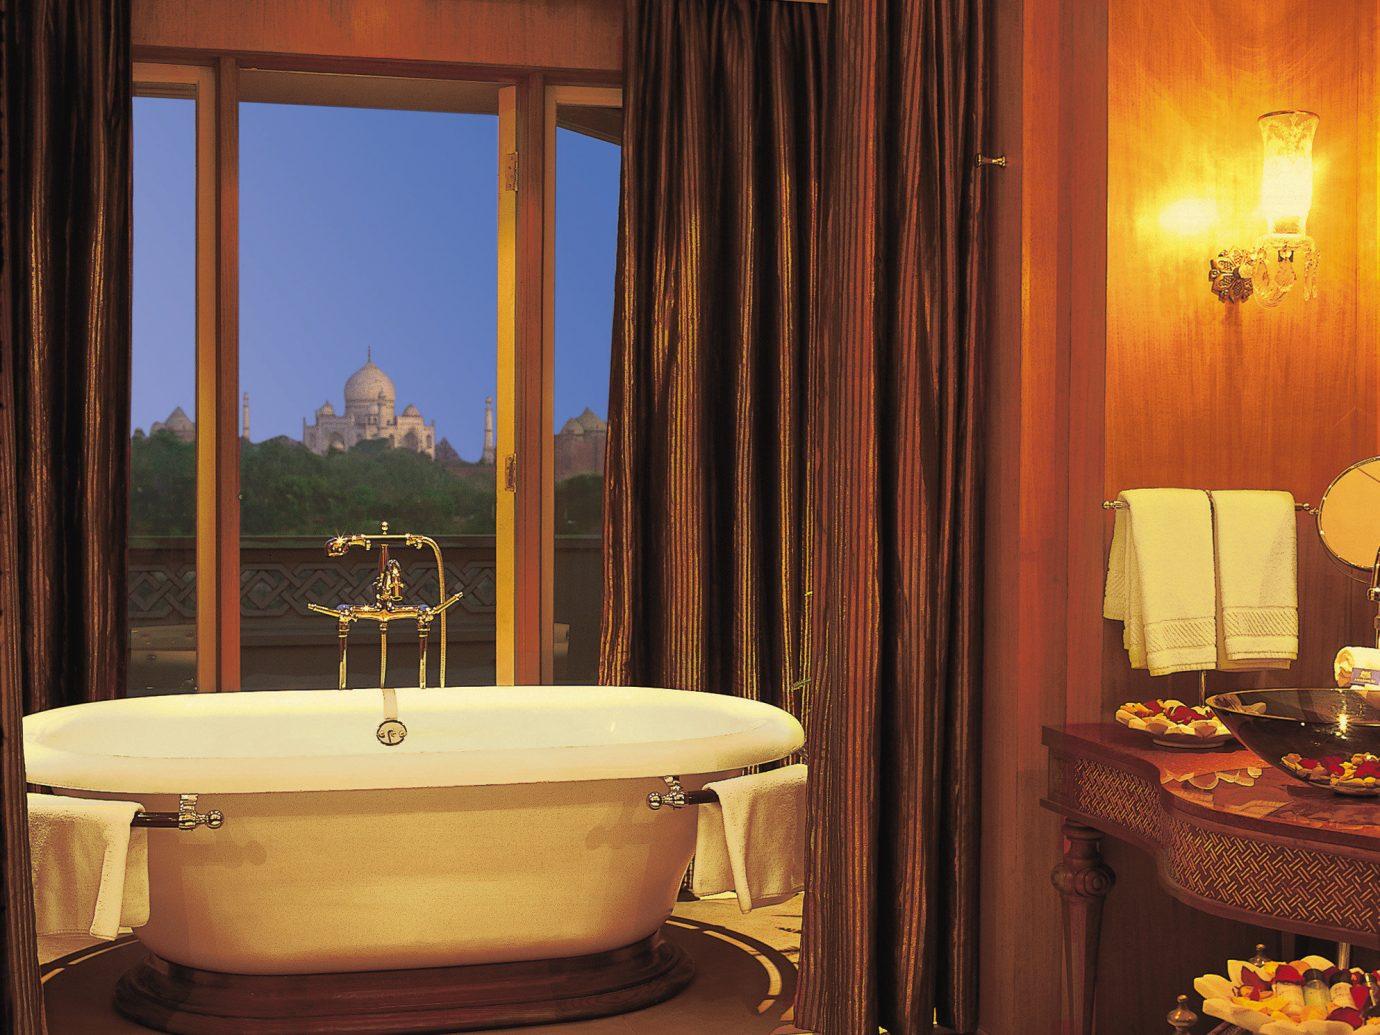 Hotels Luxury Travel indoor room window bathroom Suite interior design estate swimming pool bathtub old tub